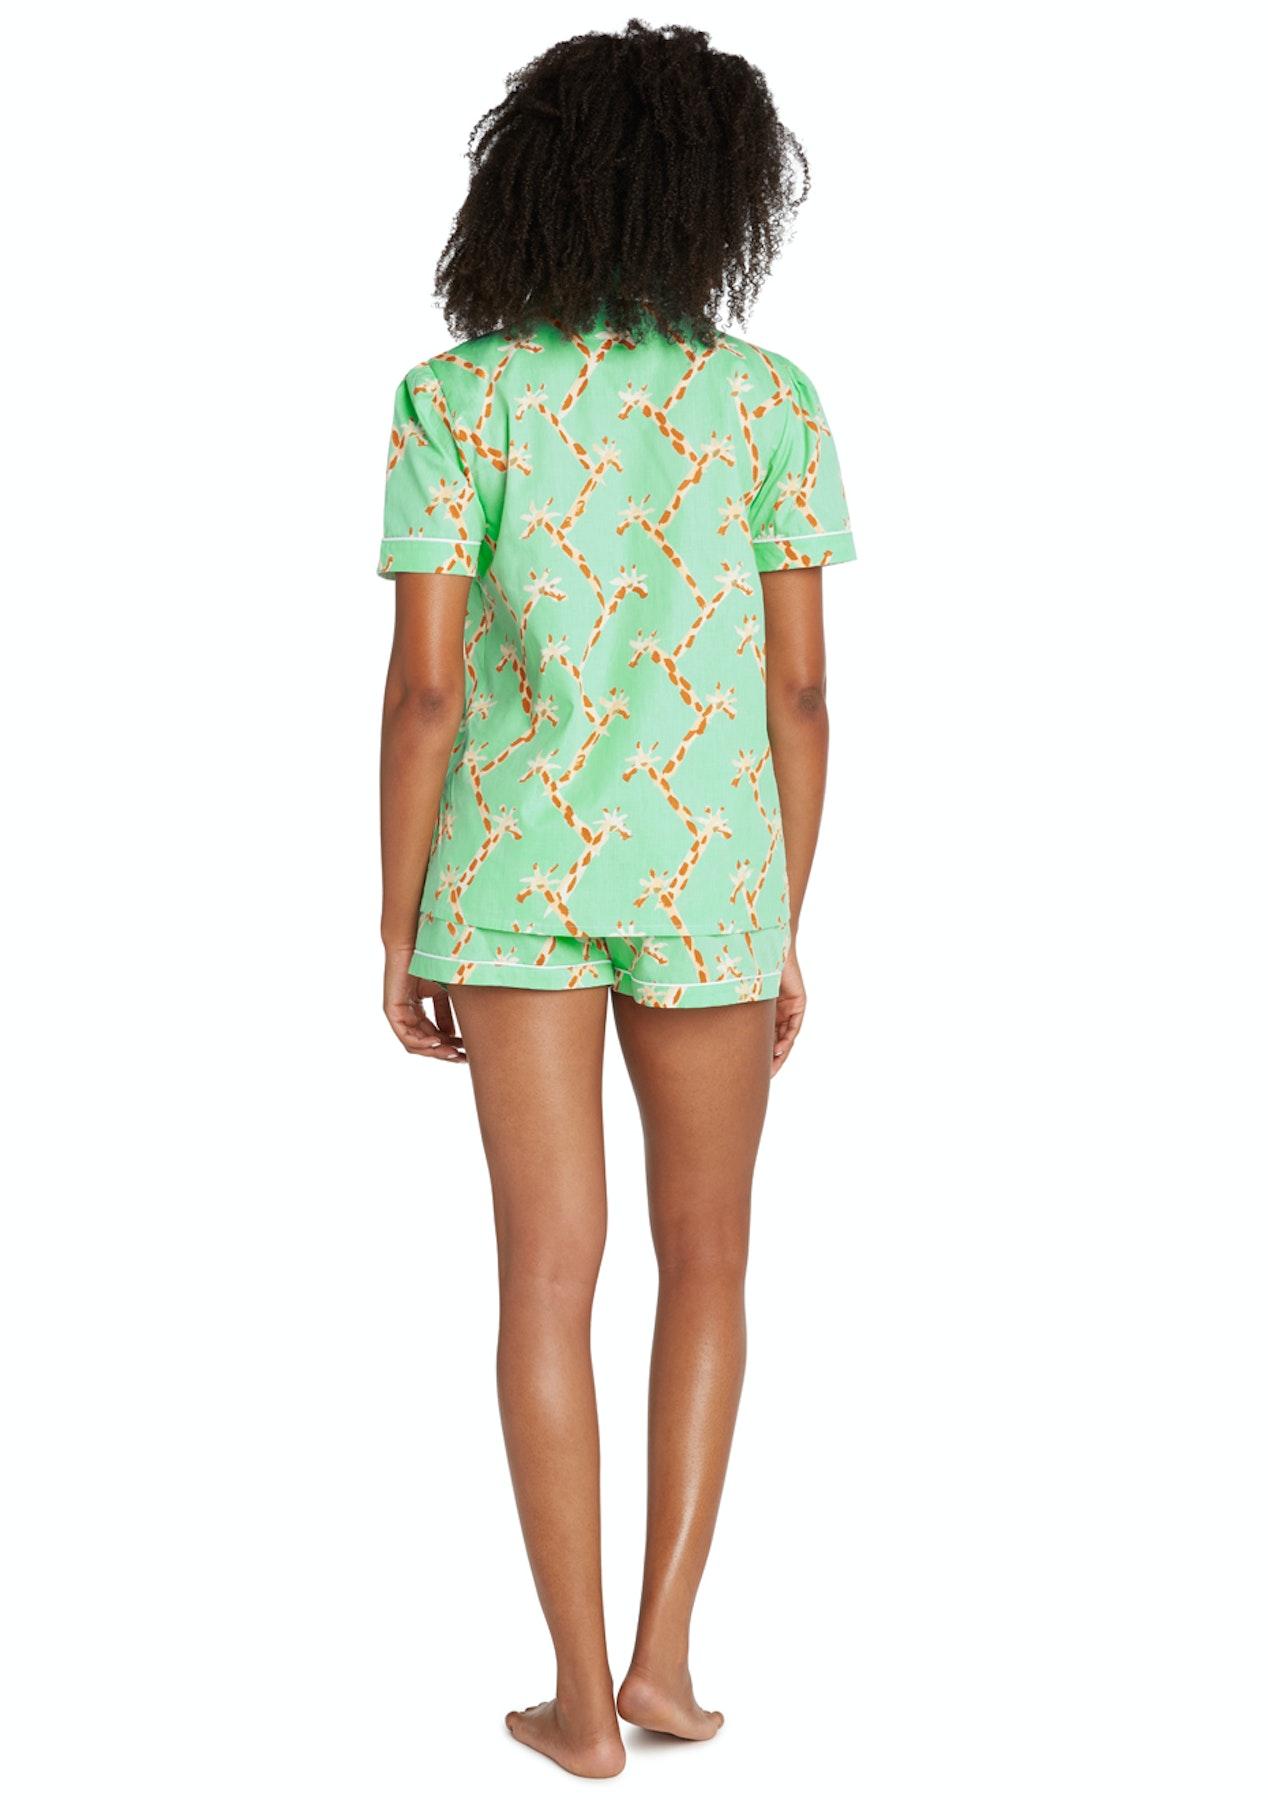 458d8c079f9c Sant   Abel - Women - Long Sleeve Shirt   PJ Pant Set - Giraffe - Luxe Silk    Sleepwear - Onceit